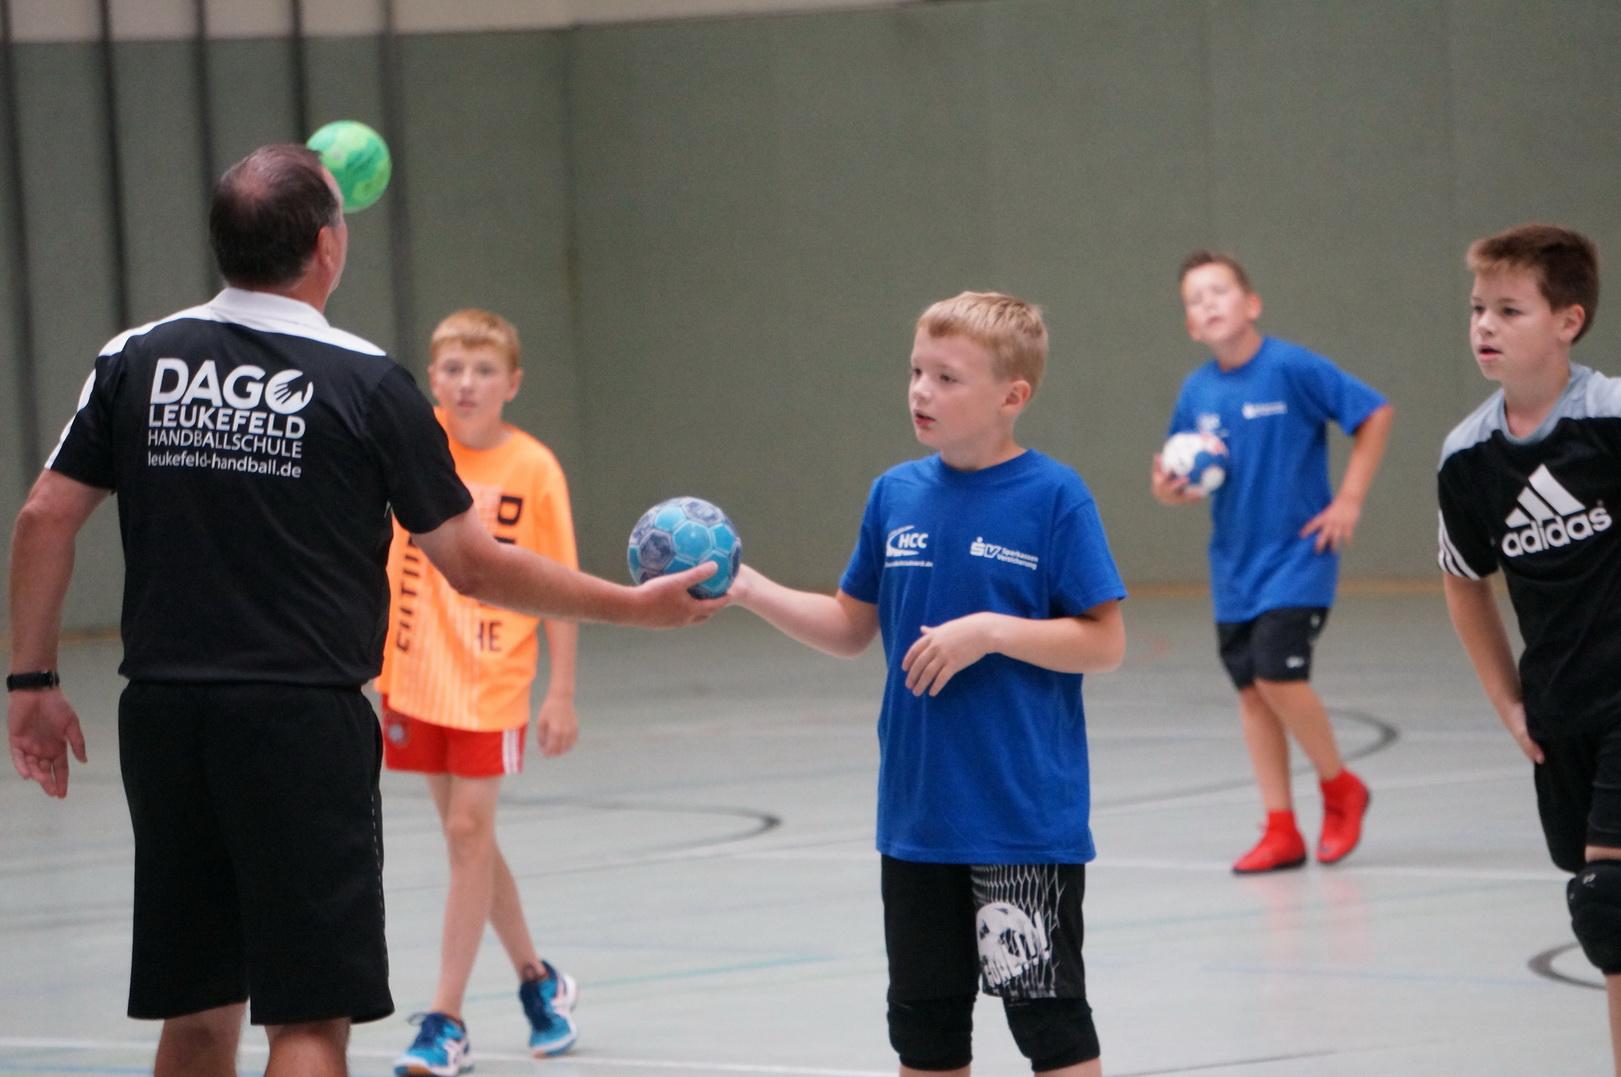 201808_Handballcamp_SDH_MG_158w